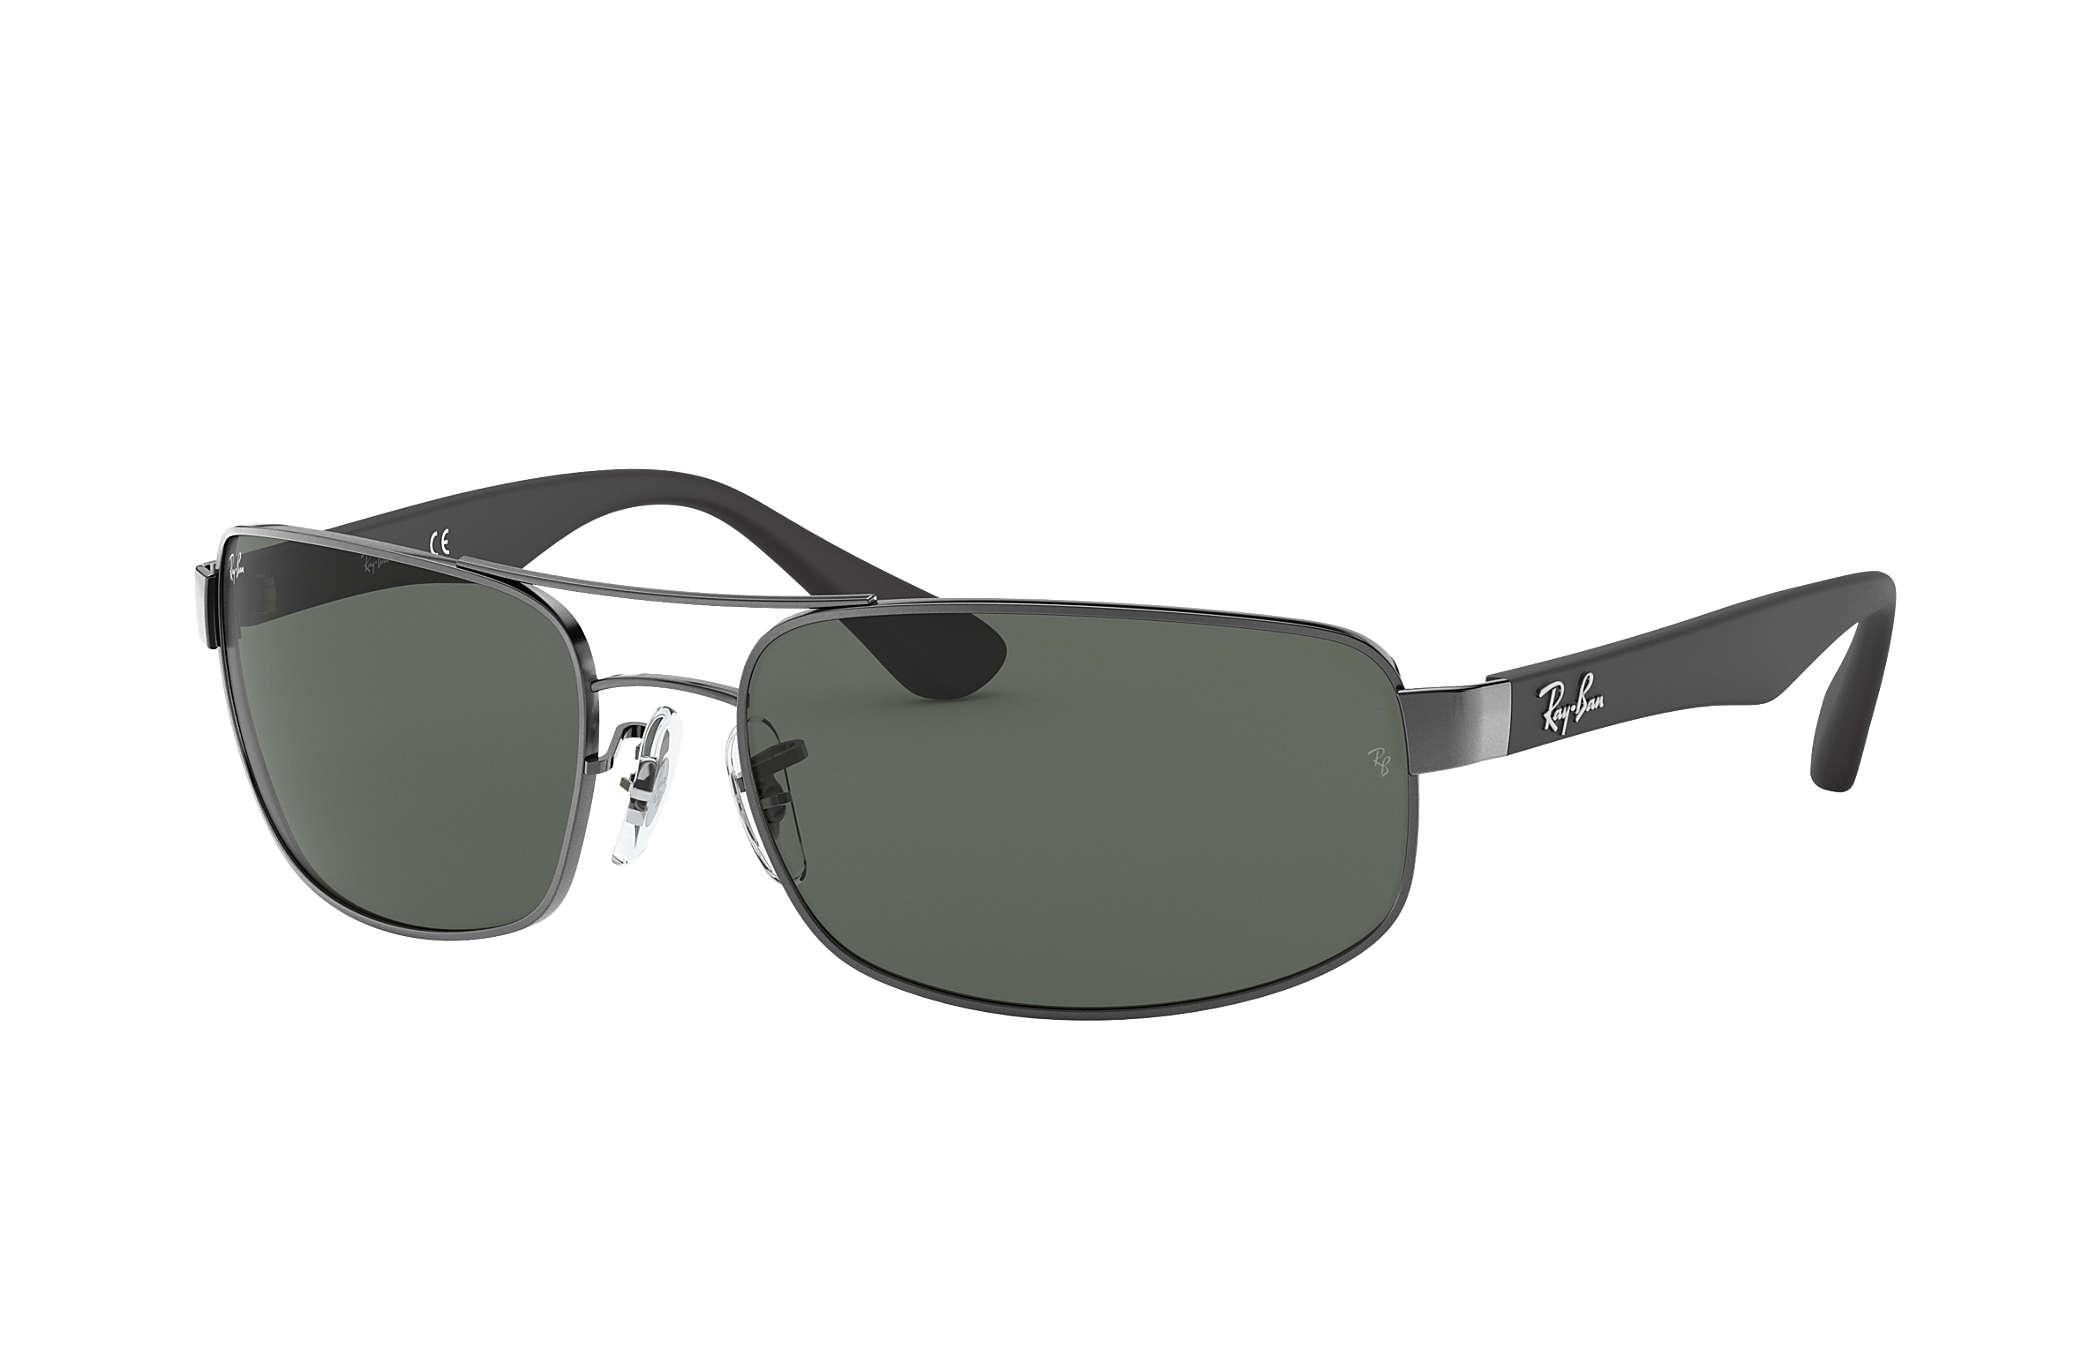 05e3abfc6fa Ray-Ban RB3183 Black - Metal - Grey Polarized Lenses - 0RB3183002 ...